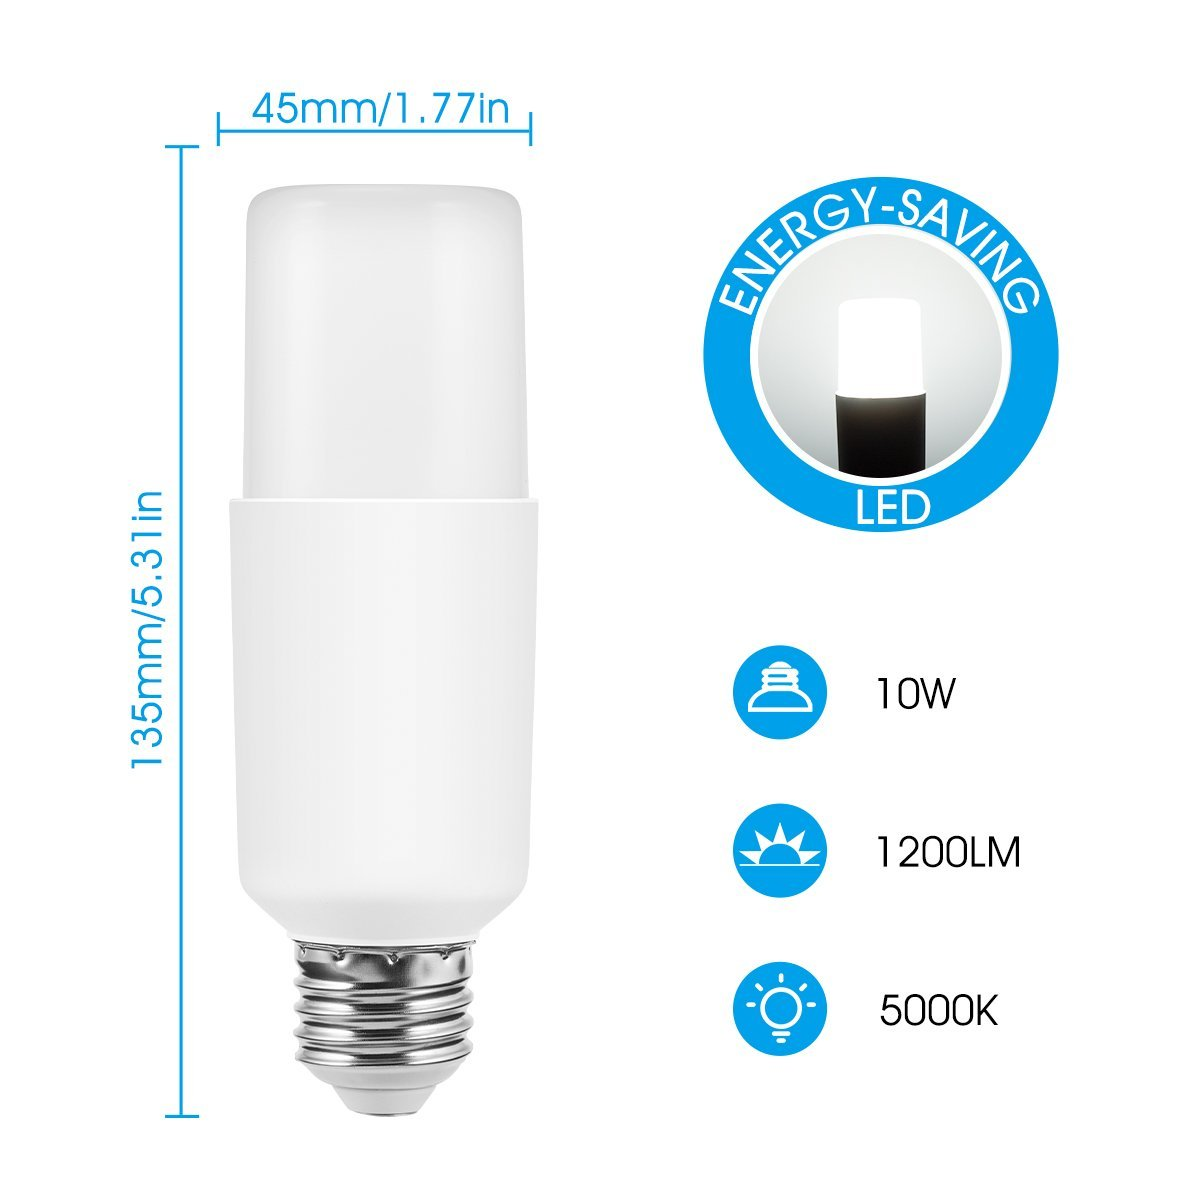 Ideal for Home Lighting 2 Pack Not Dimmable E26 Base 1200LM Showcase 10W JandCase 100W Incandescent Equivalent Tubular Led Bulb T10 LED Light Bulb 5000K Daylight White Downlight